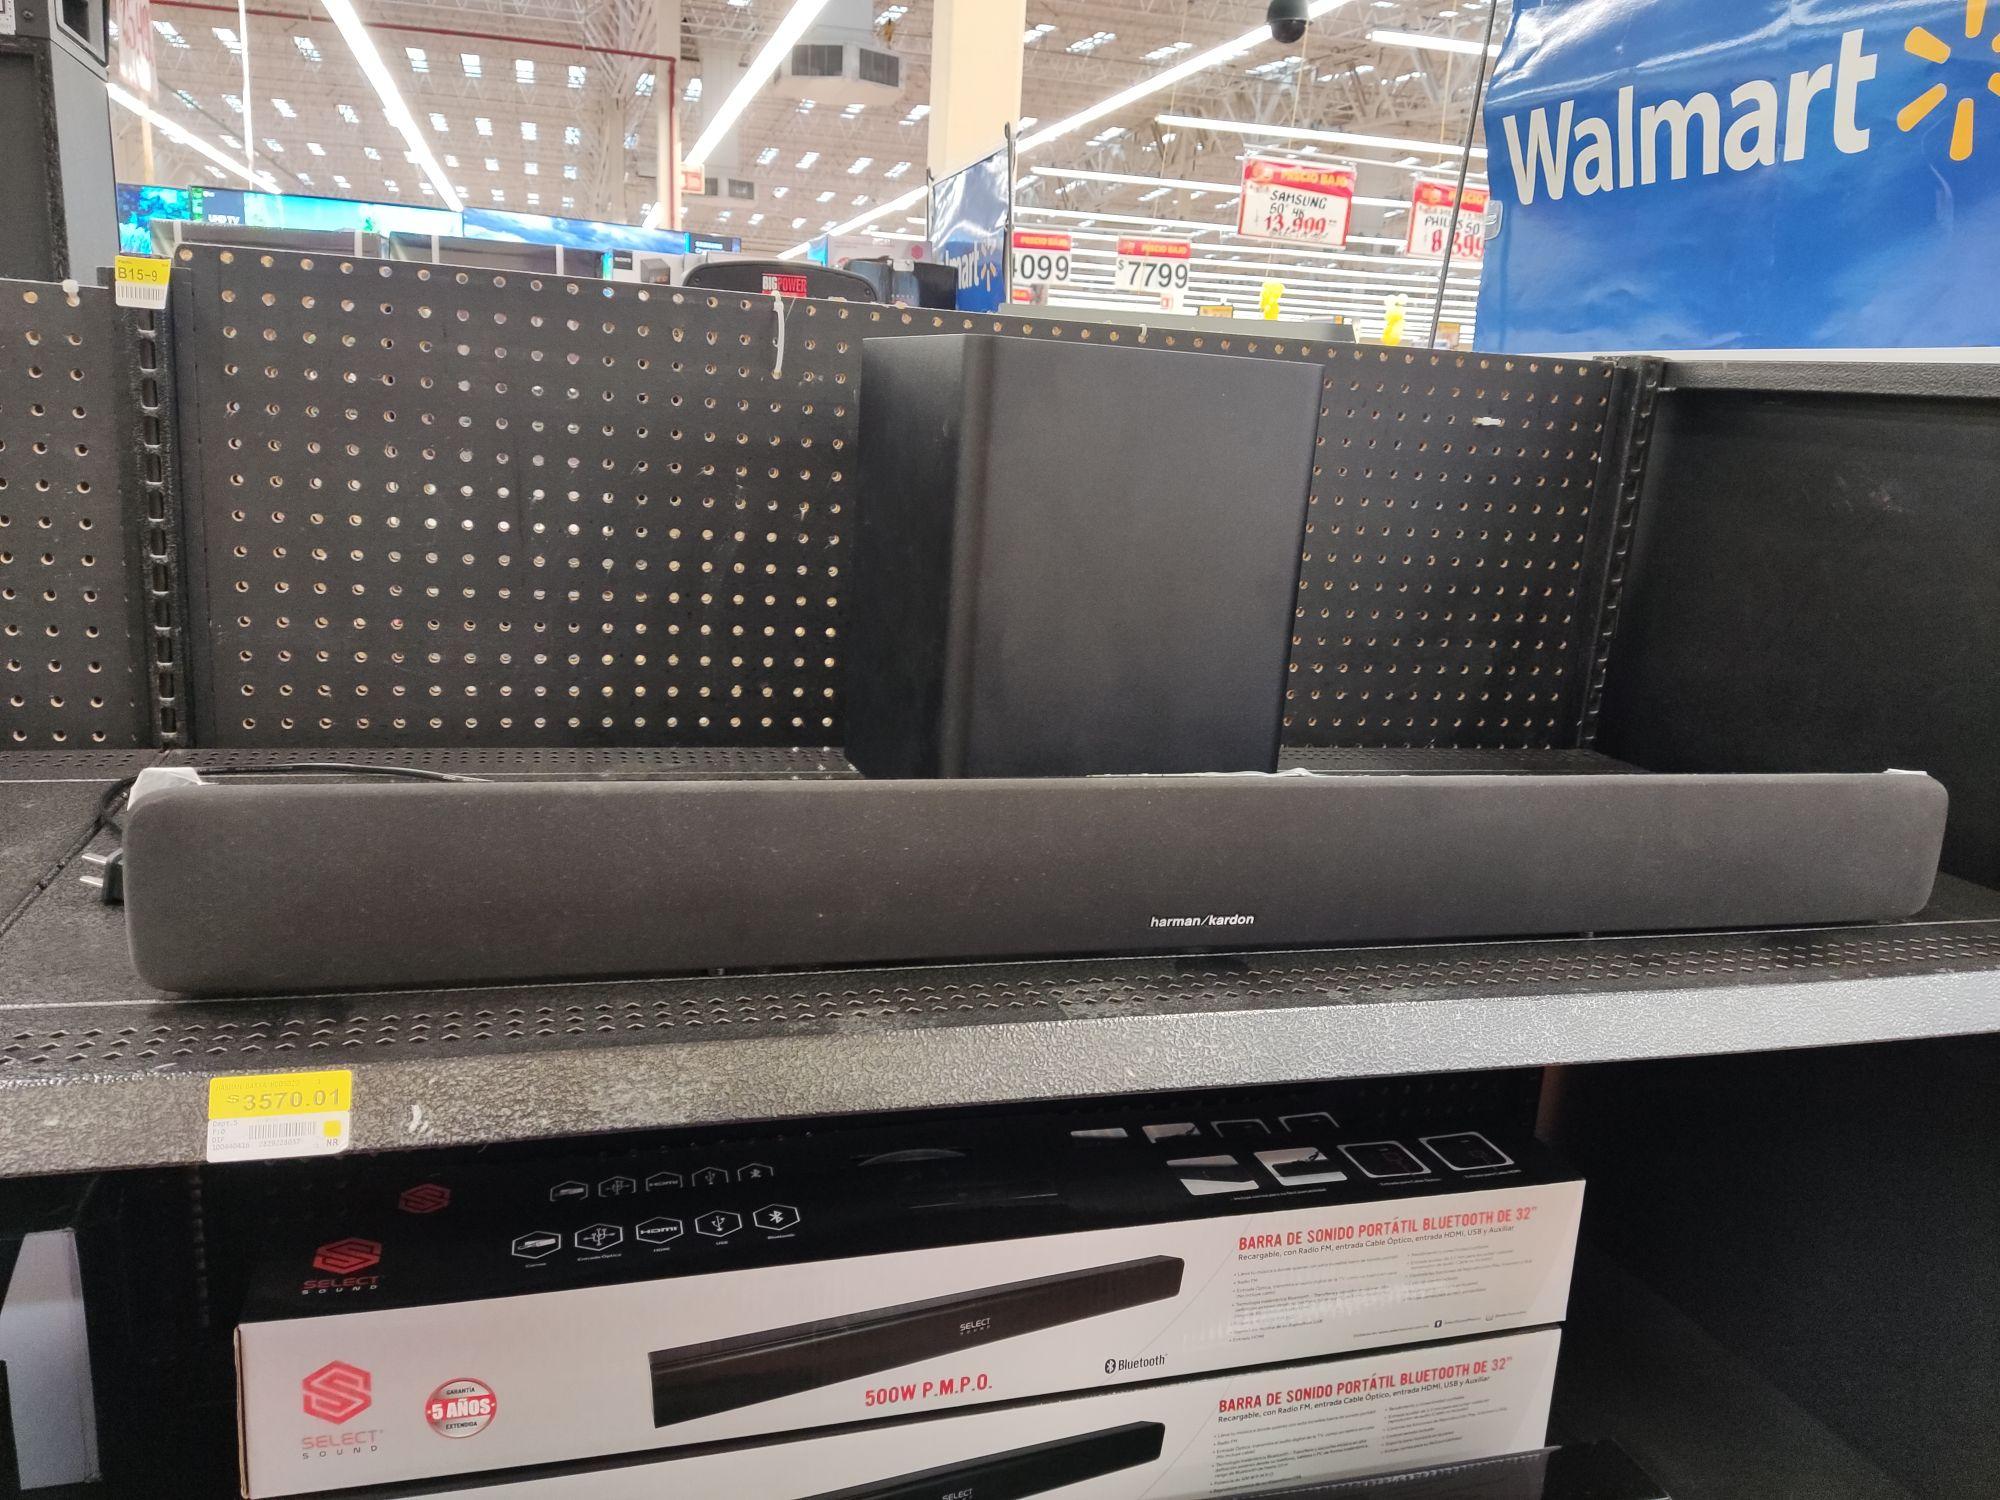 Walmart: Harman Kardon mod sb20